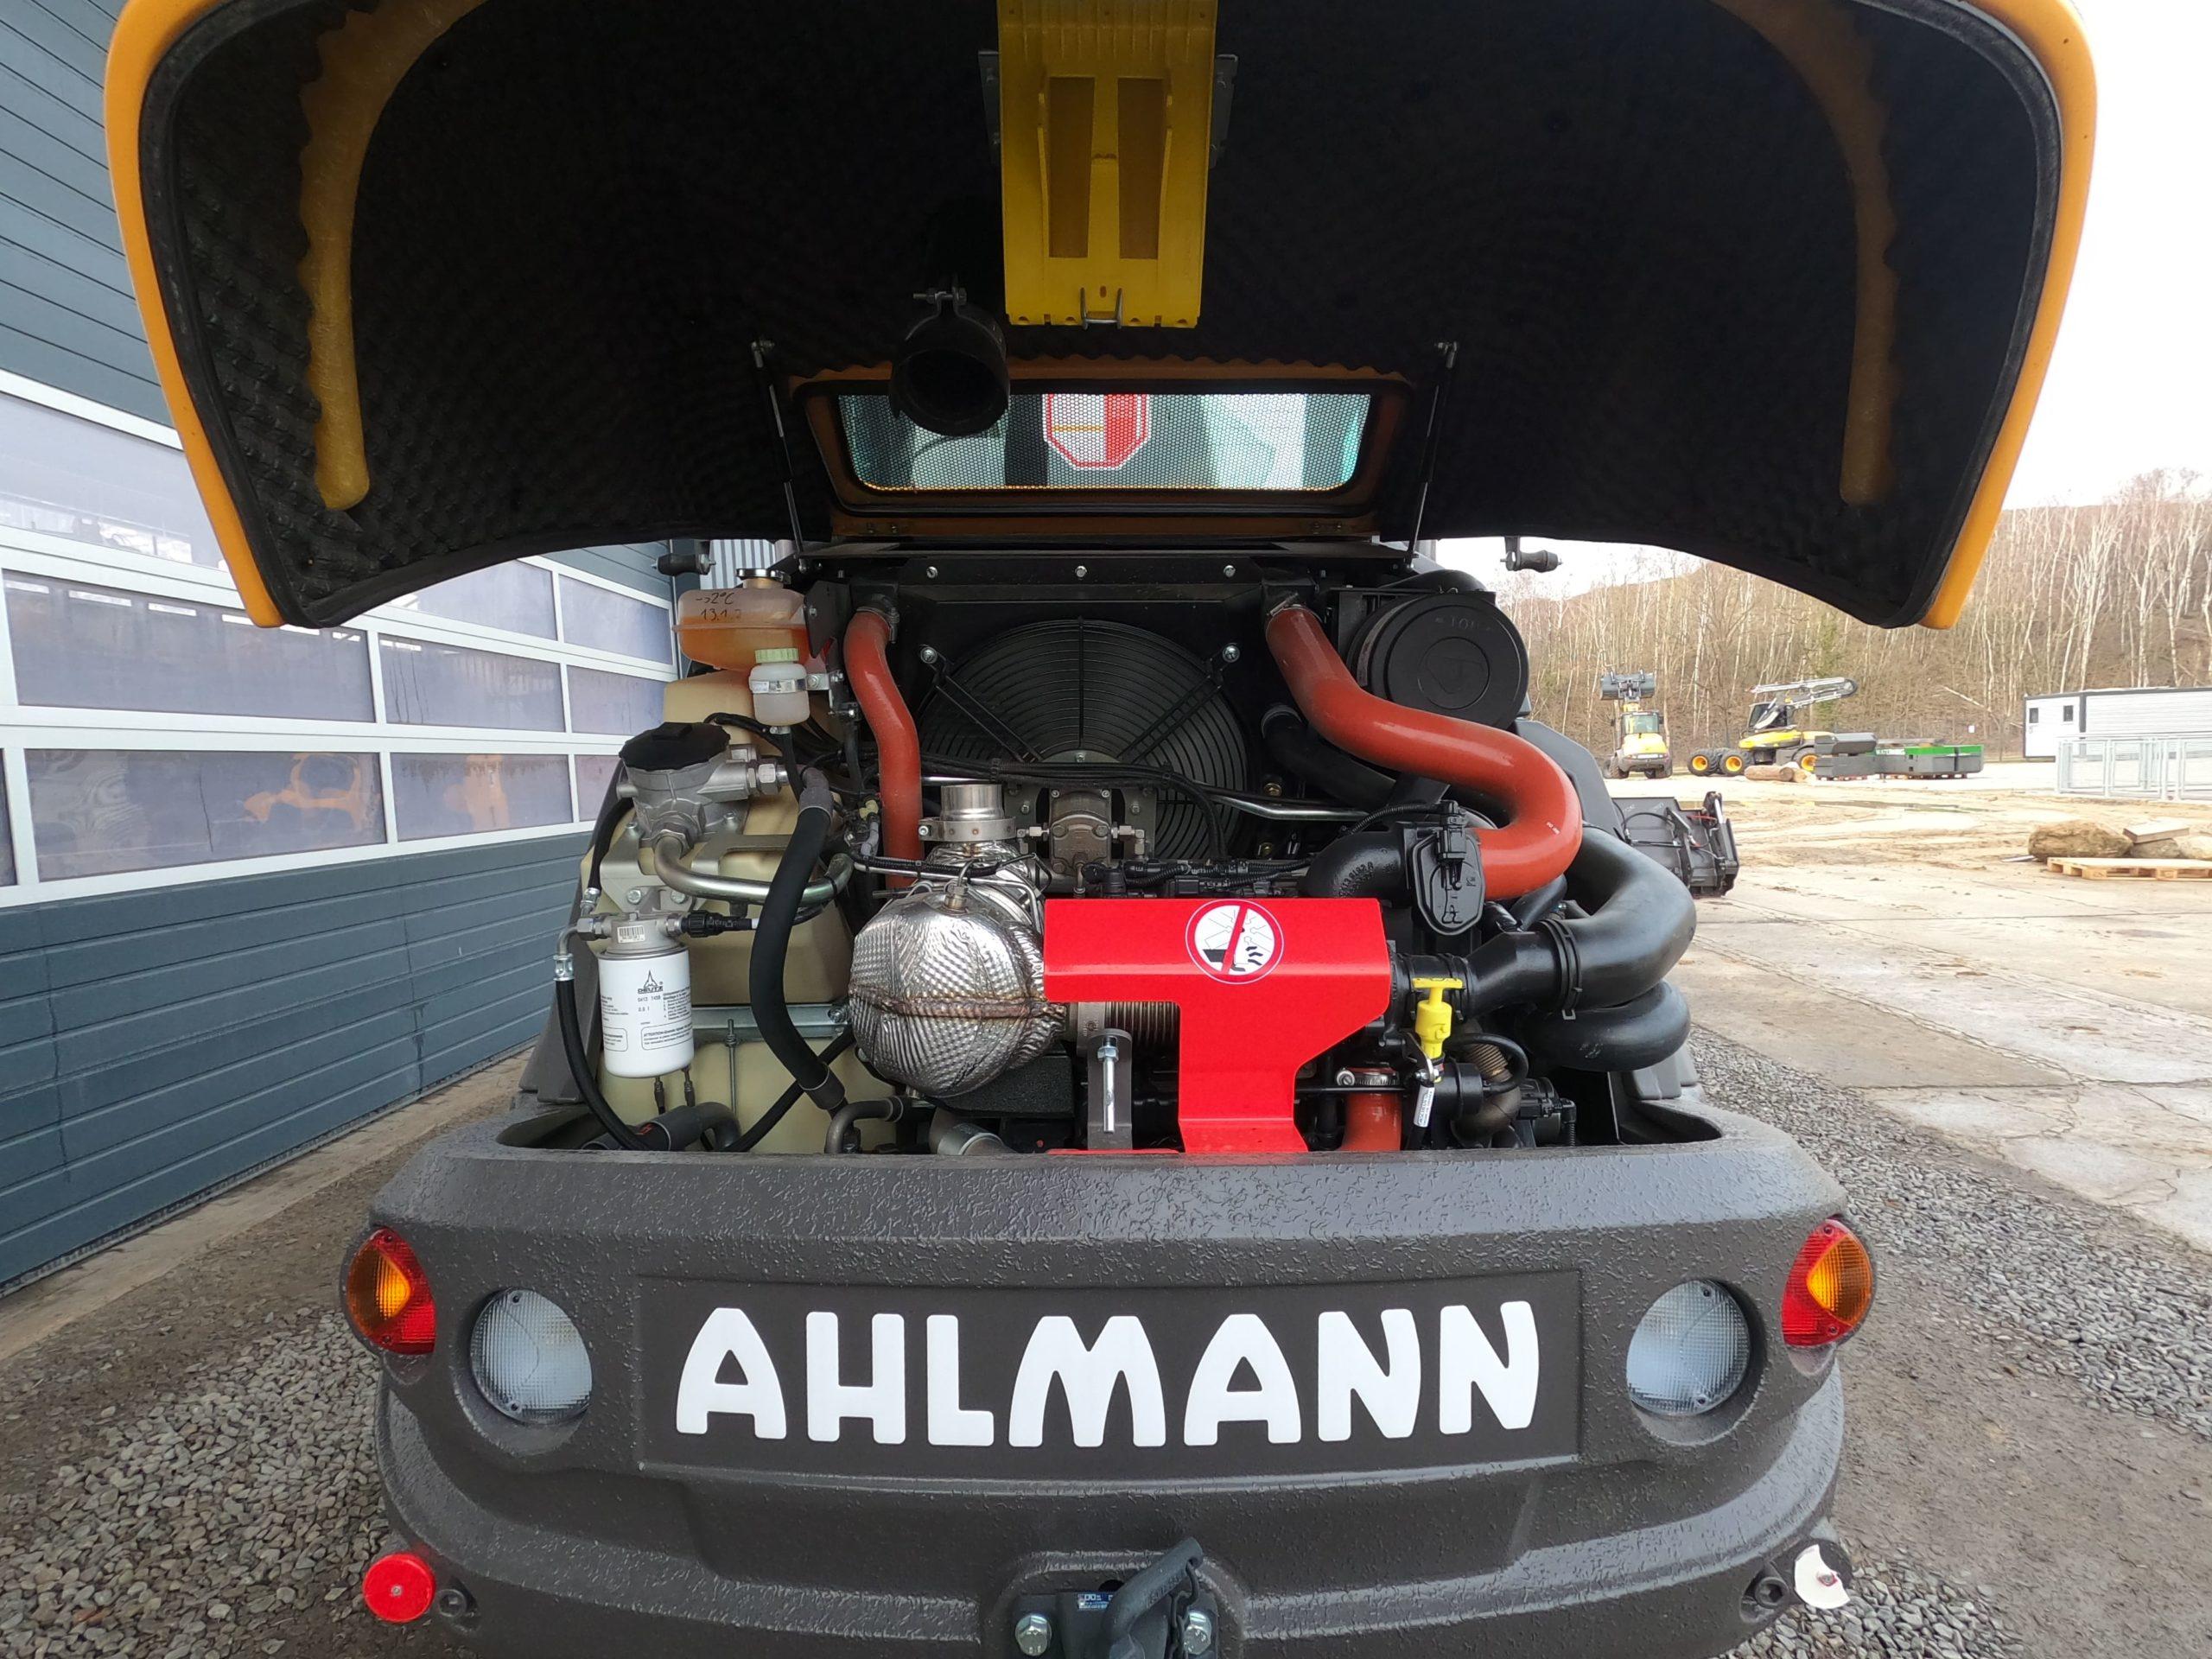 AS900_Ahlmann_Mecalac_Schwenklader_Radlader_MBN_Hoppe_Hannover_Stadthagen_kaufen_Motor